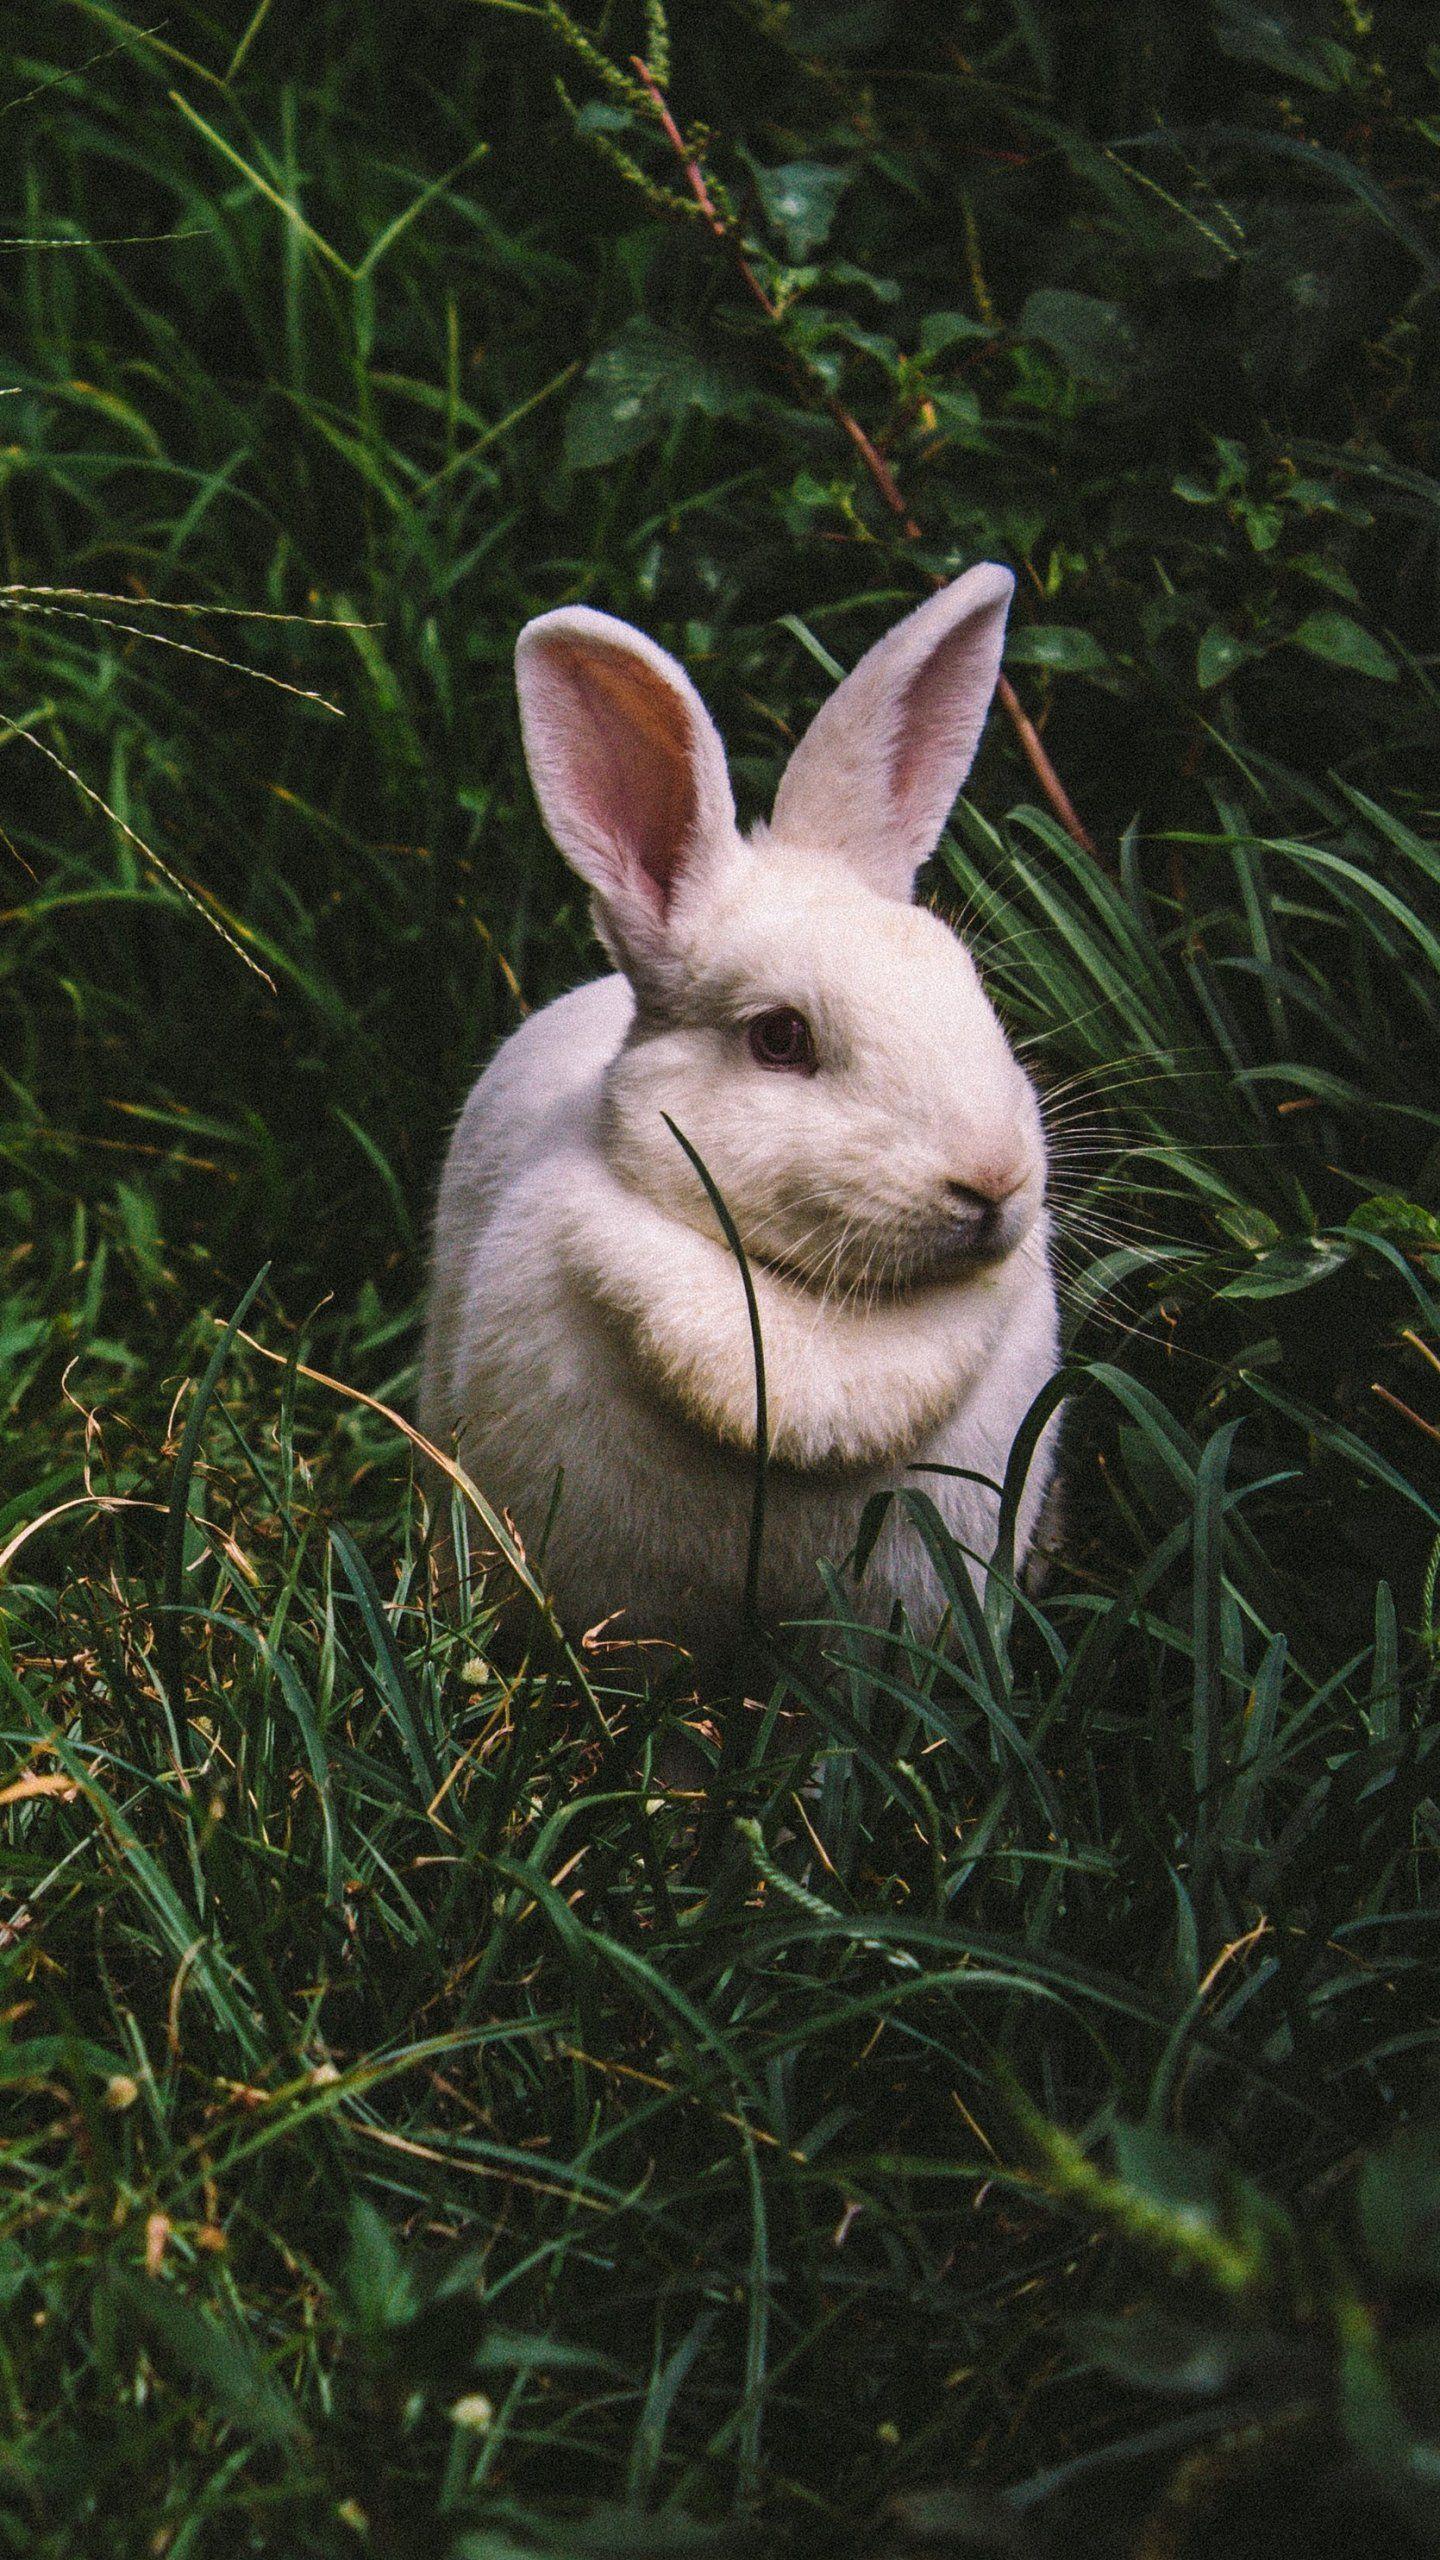 White Rabbit Wallpaper Iphone Android Desktop Backgrounds Rabbit Wallpaper Wildlife Wallpaper Animals